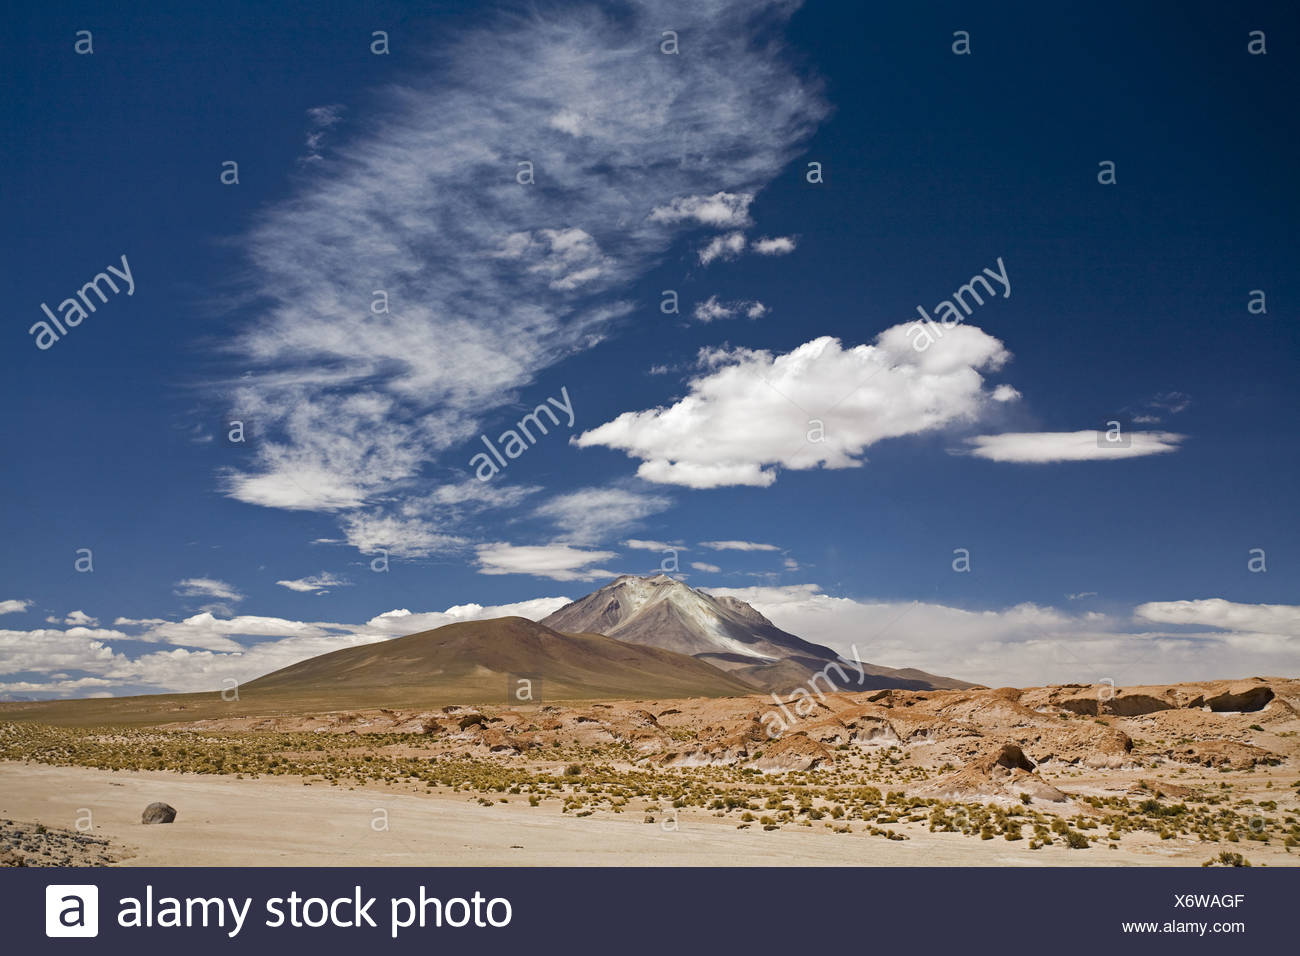 Der aktive Vulkan Ollague, Altiplano, Bolivien, Südamerika Stockbild